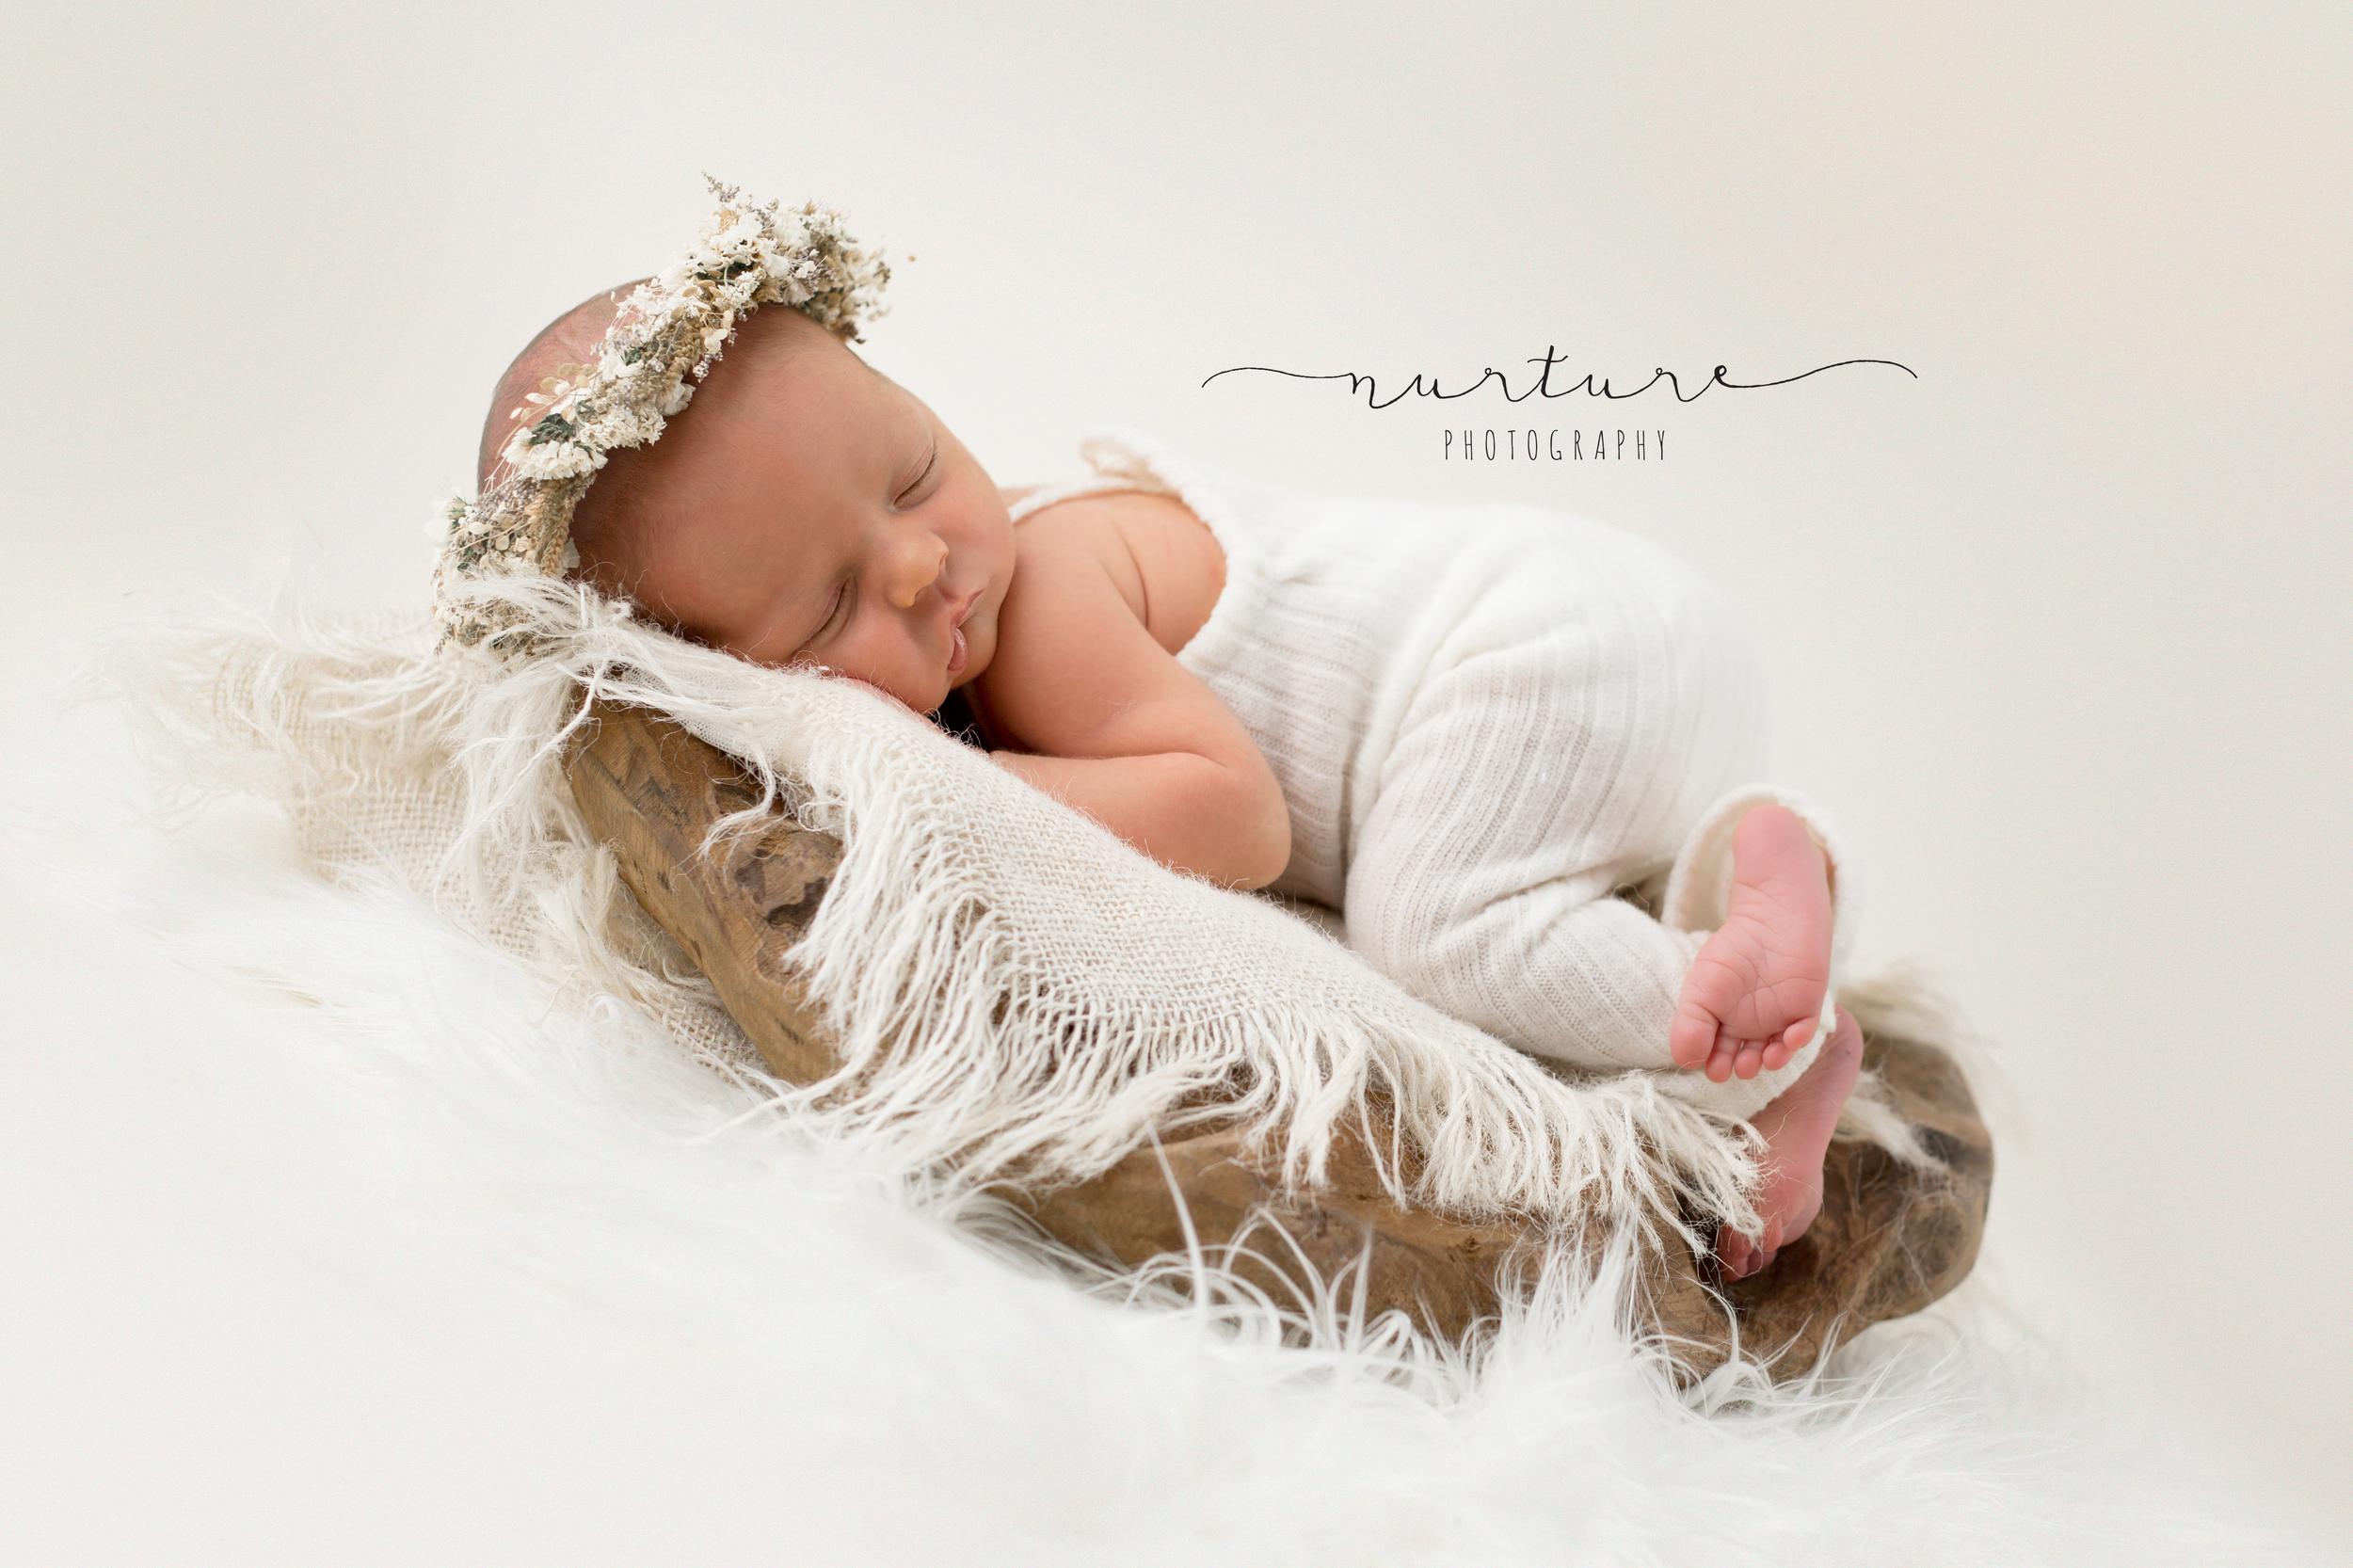 torrance-redondobeach-hermosabeach-manhattanbeach-palosverdes-southbay-photographer-newborn-baby-newbornphotographer-nurturephotography-babyphotographer-newbornphotographer9987.jpg